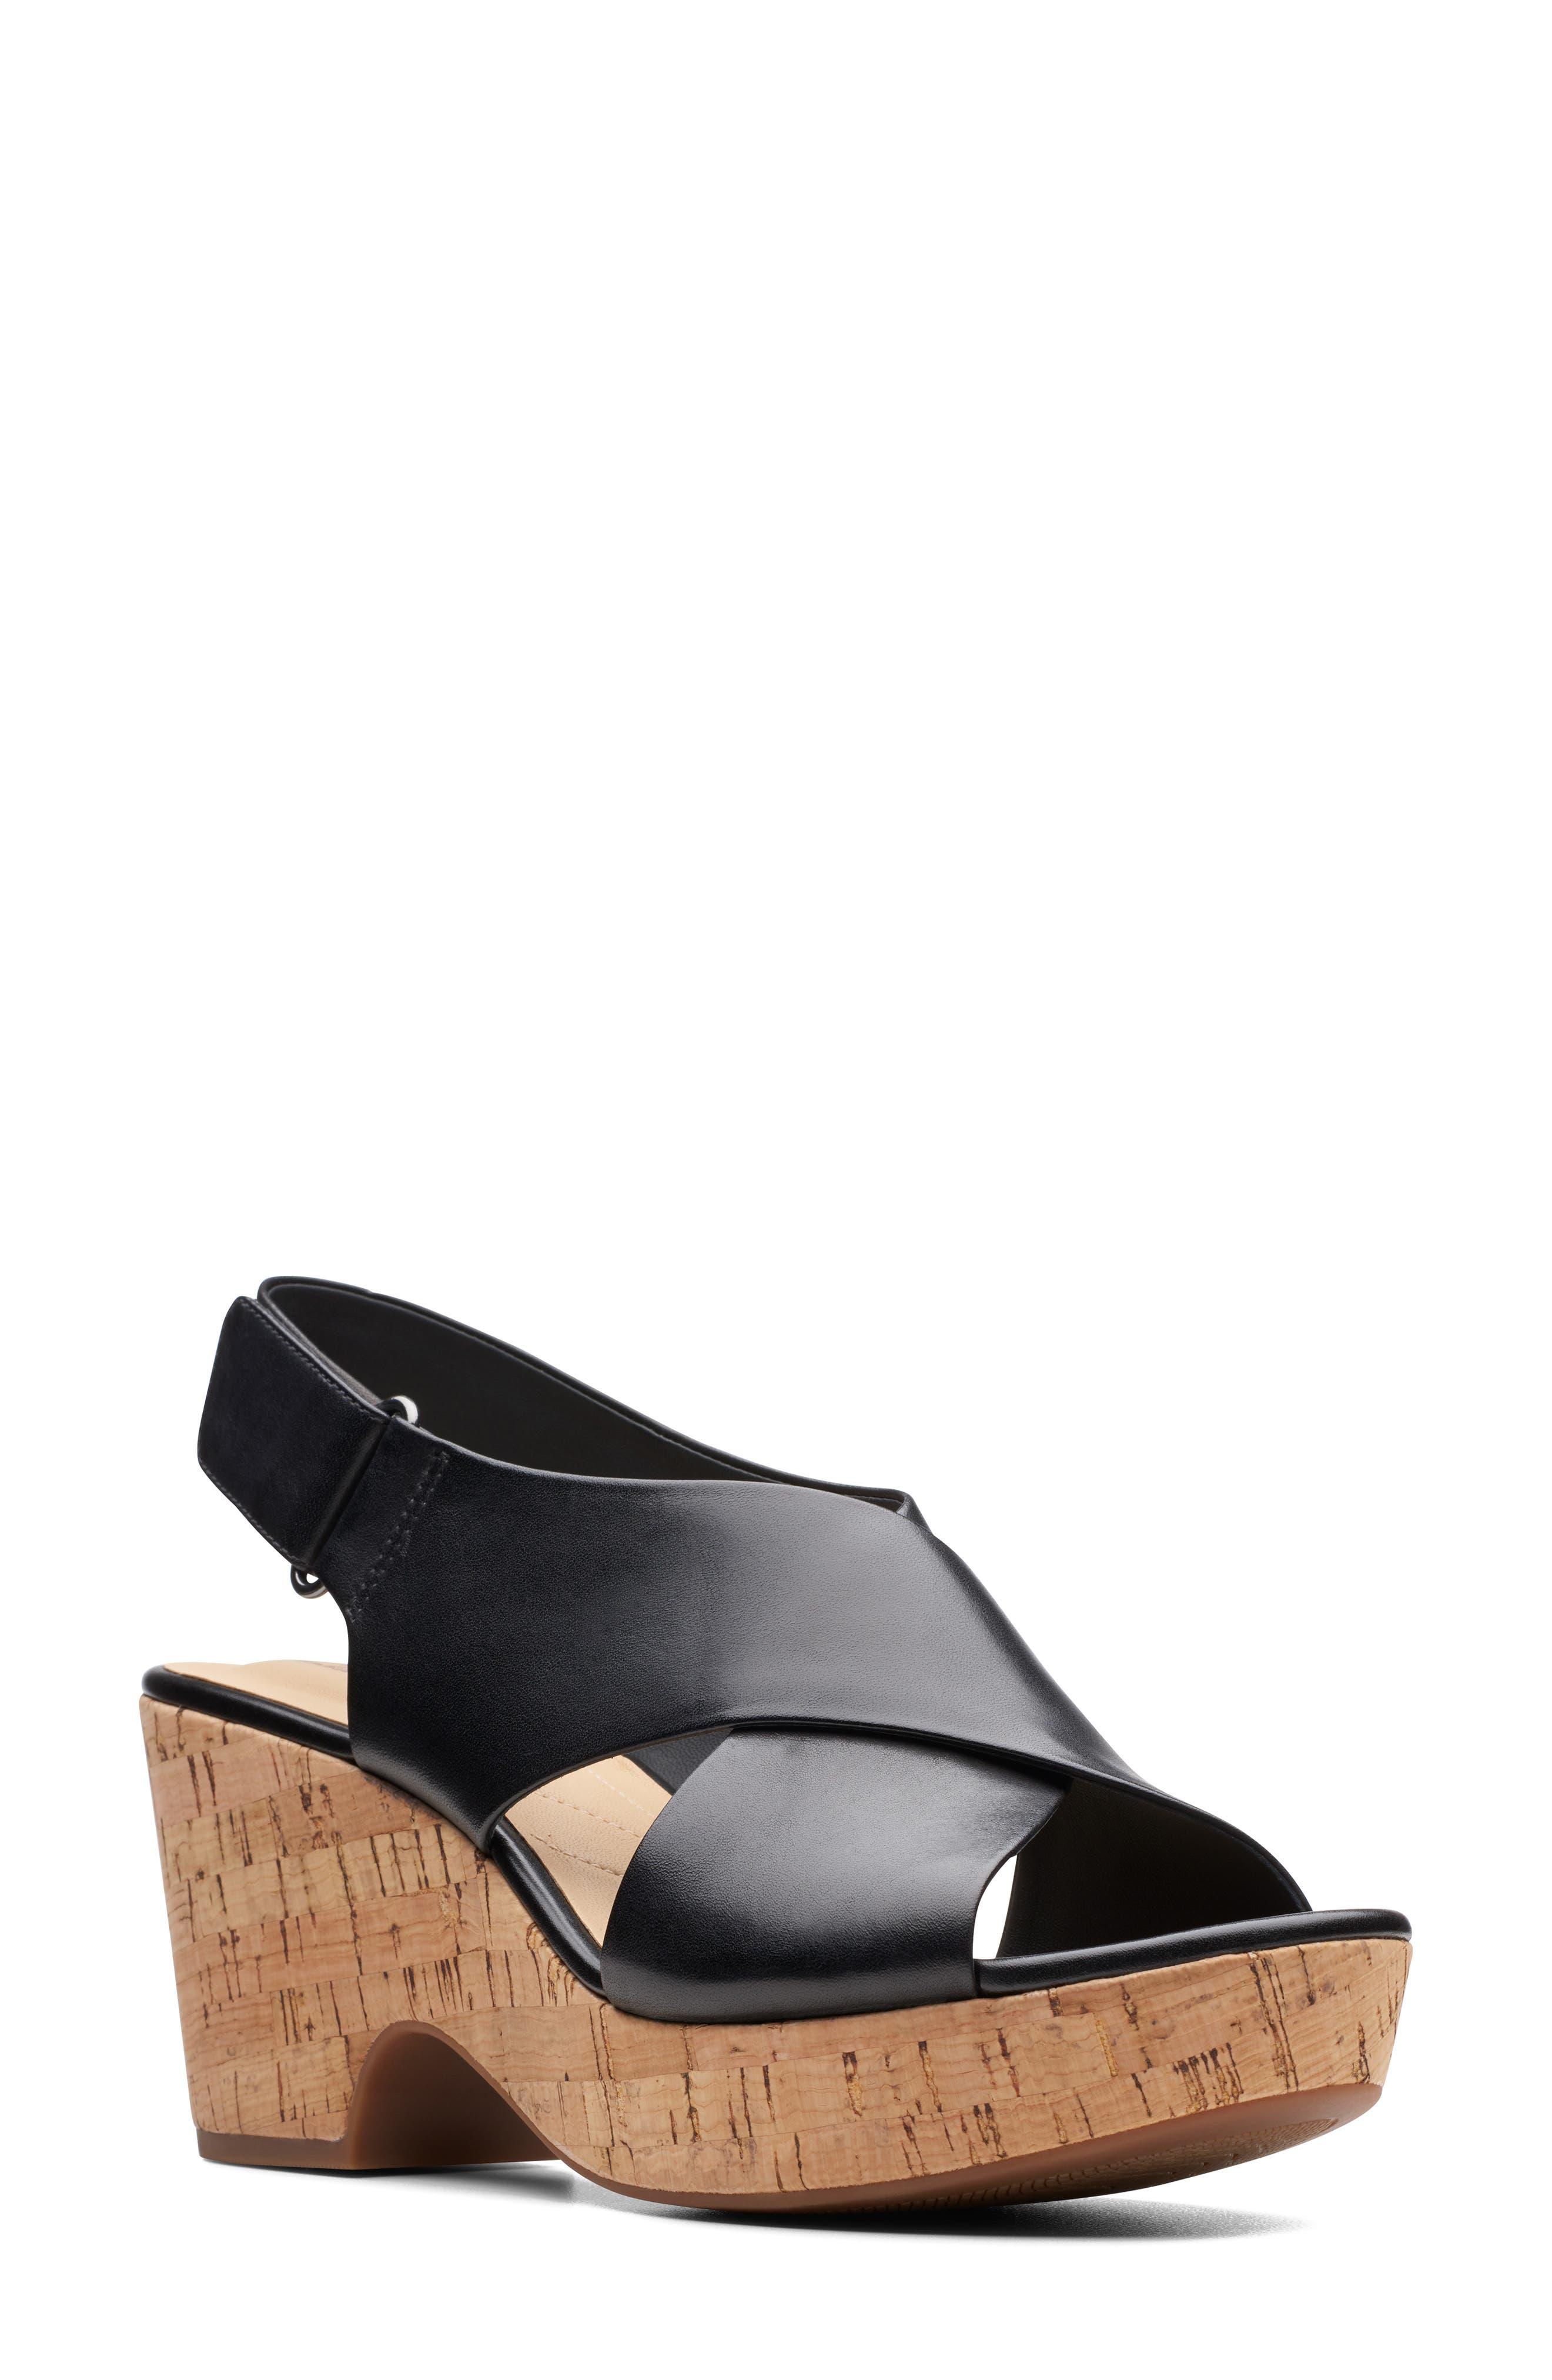 CLARKS<SUP>®</SUP> Maritsa Lara Slingback Sandal, Main, color, BLACK LEATHER